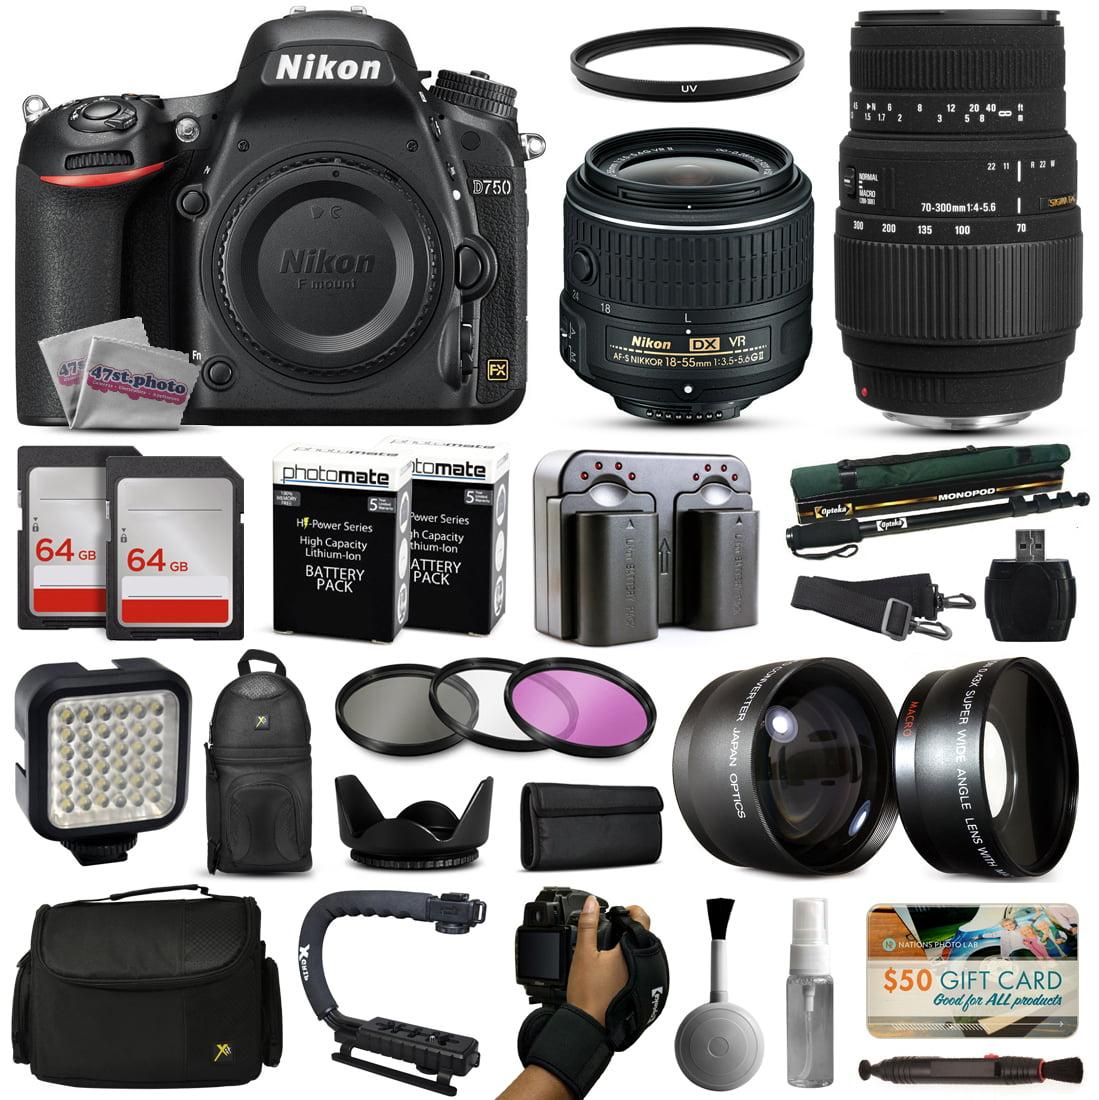 Nikon D750 DSLR Digital Camera with 18-55mm VR II + Sigma 70-300mm Lens + 128GB Memory + 2 Batteries + Charger... by Nikon